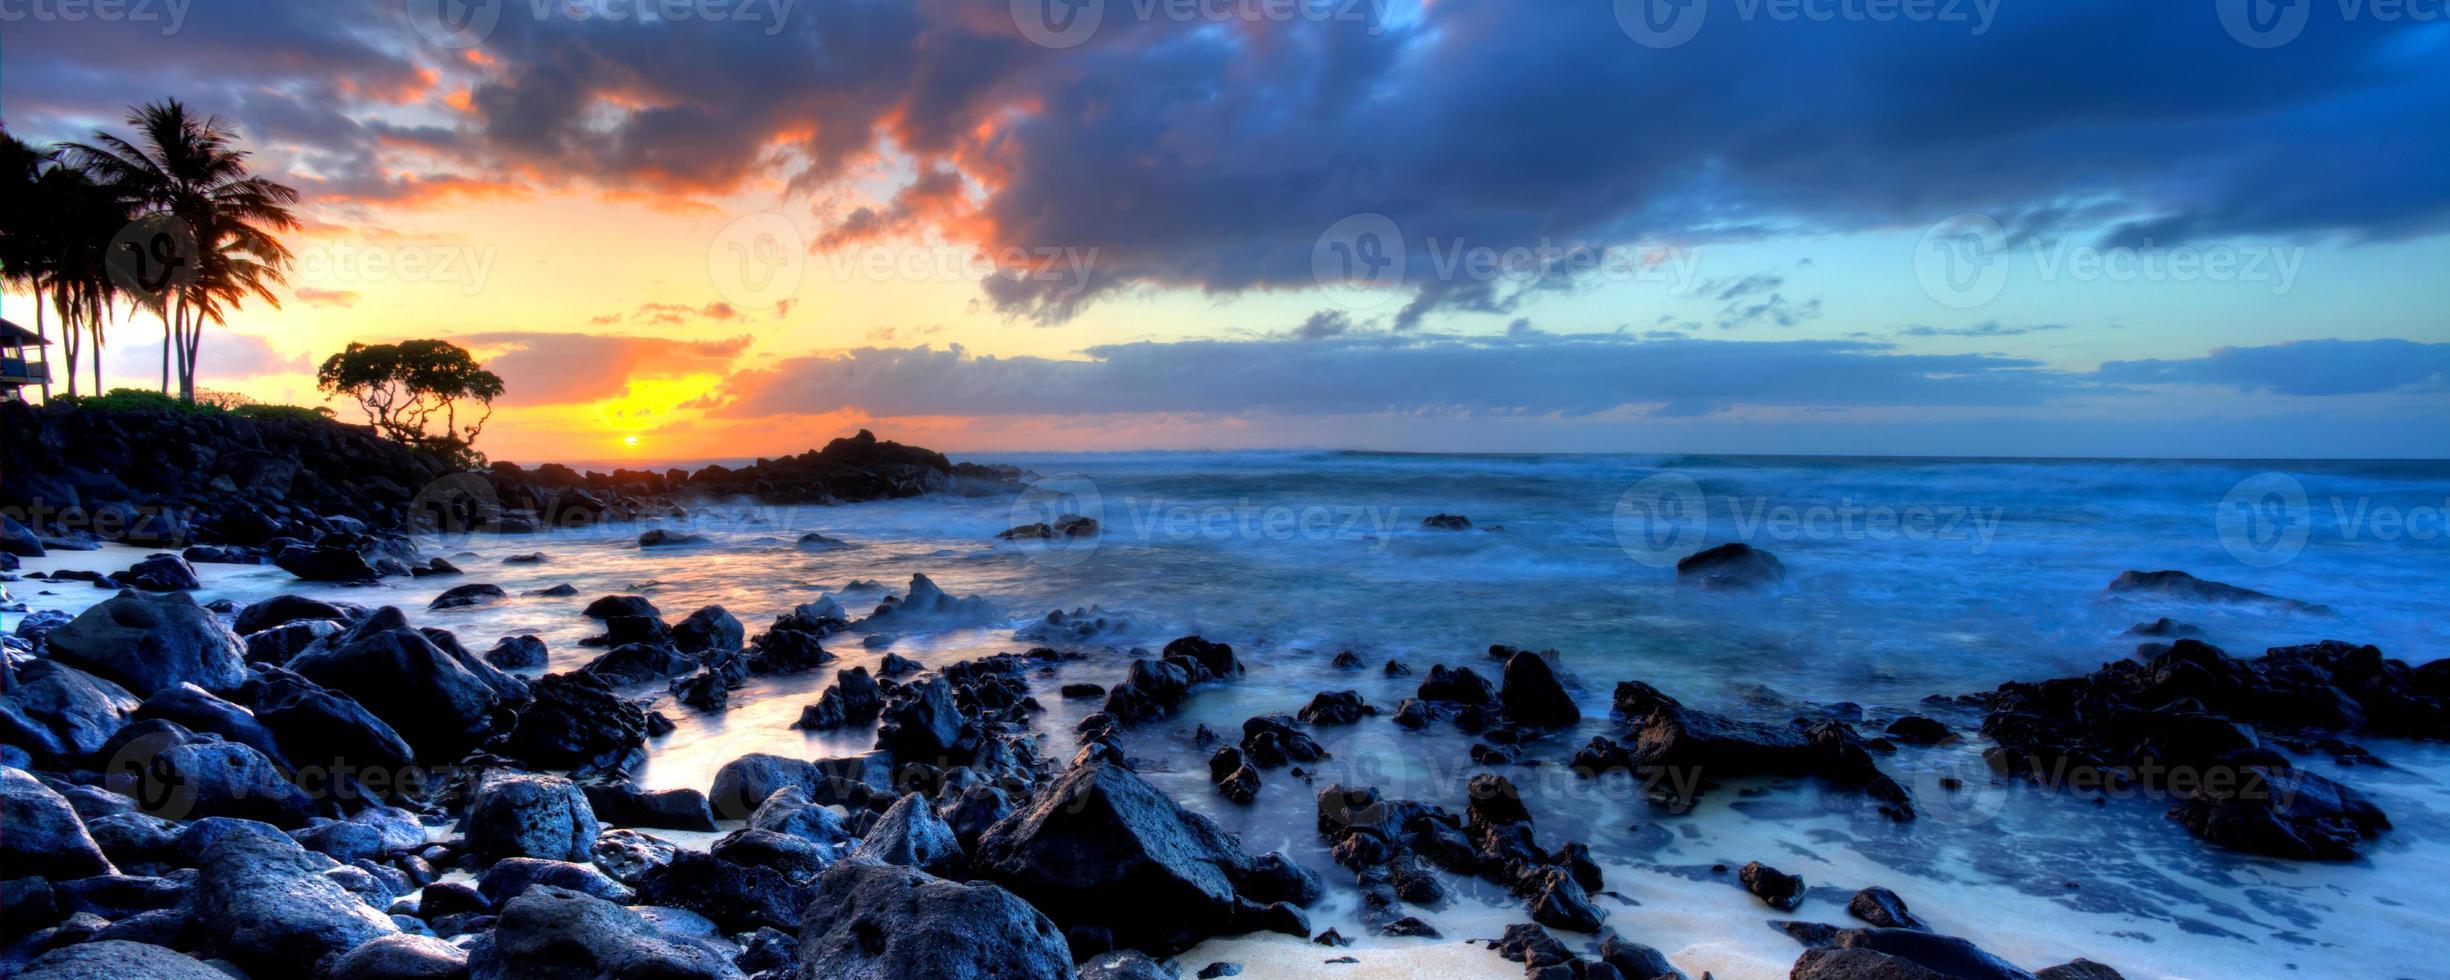 aloha nachten foto